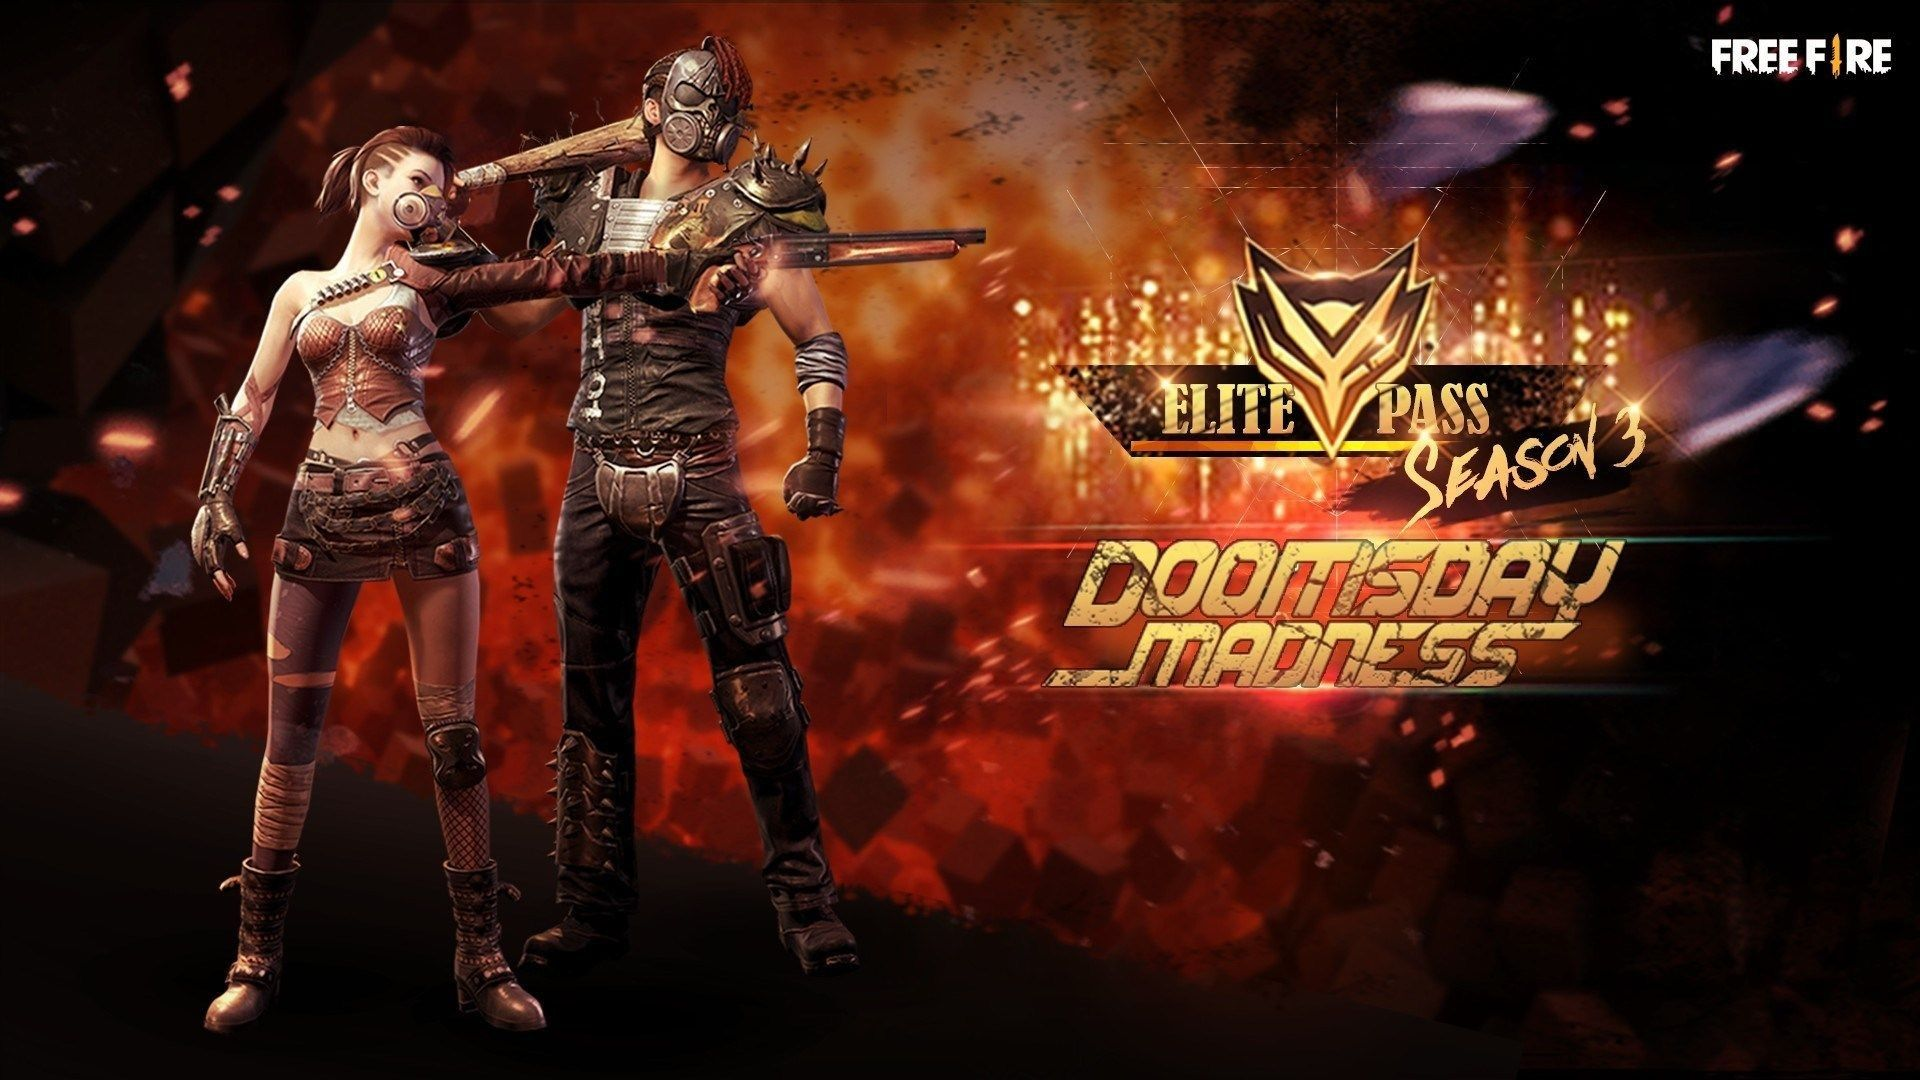 Free Fire Season 3 Elite Pass Pc Wallpaper In 2021 Attack On Titan Season Fire Image Shadowhunters Tv Show